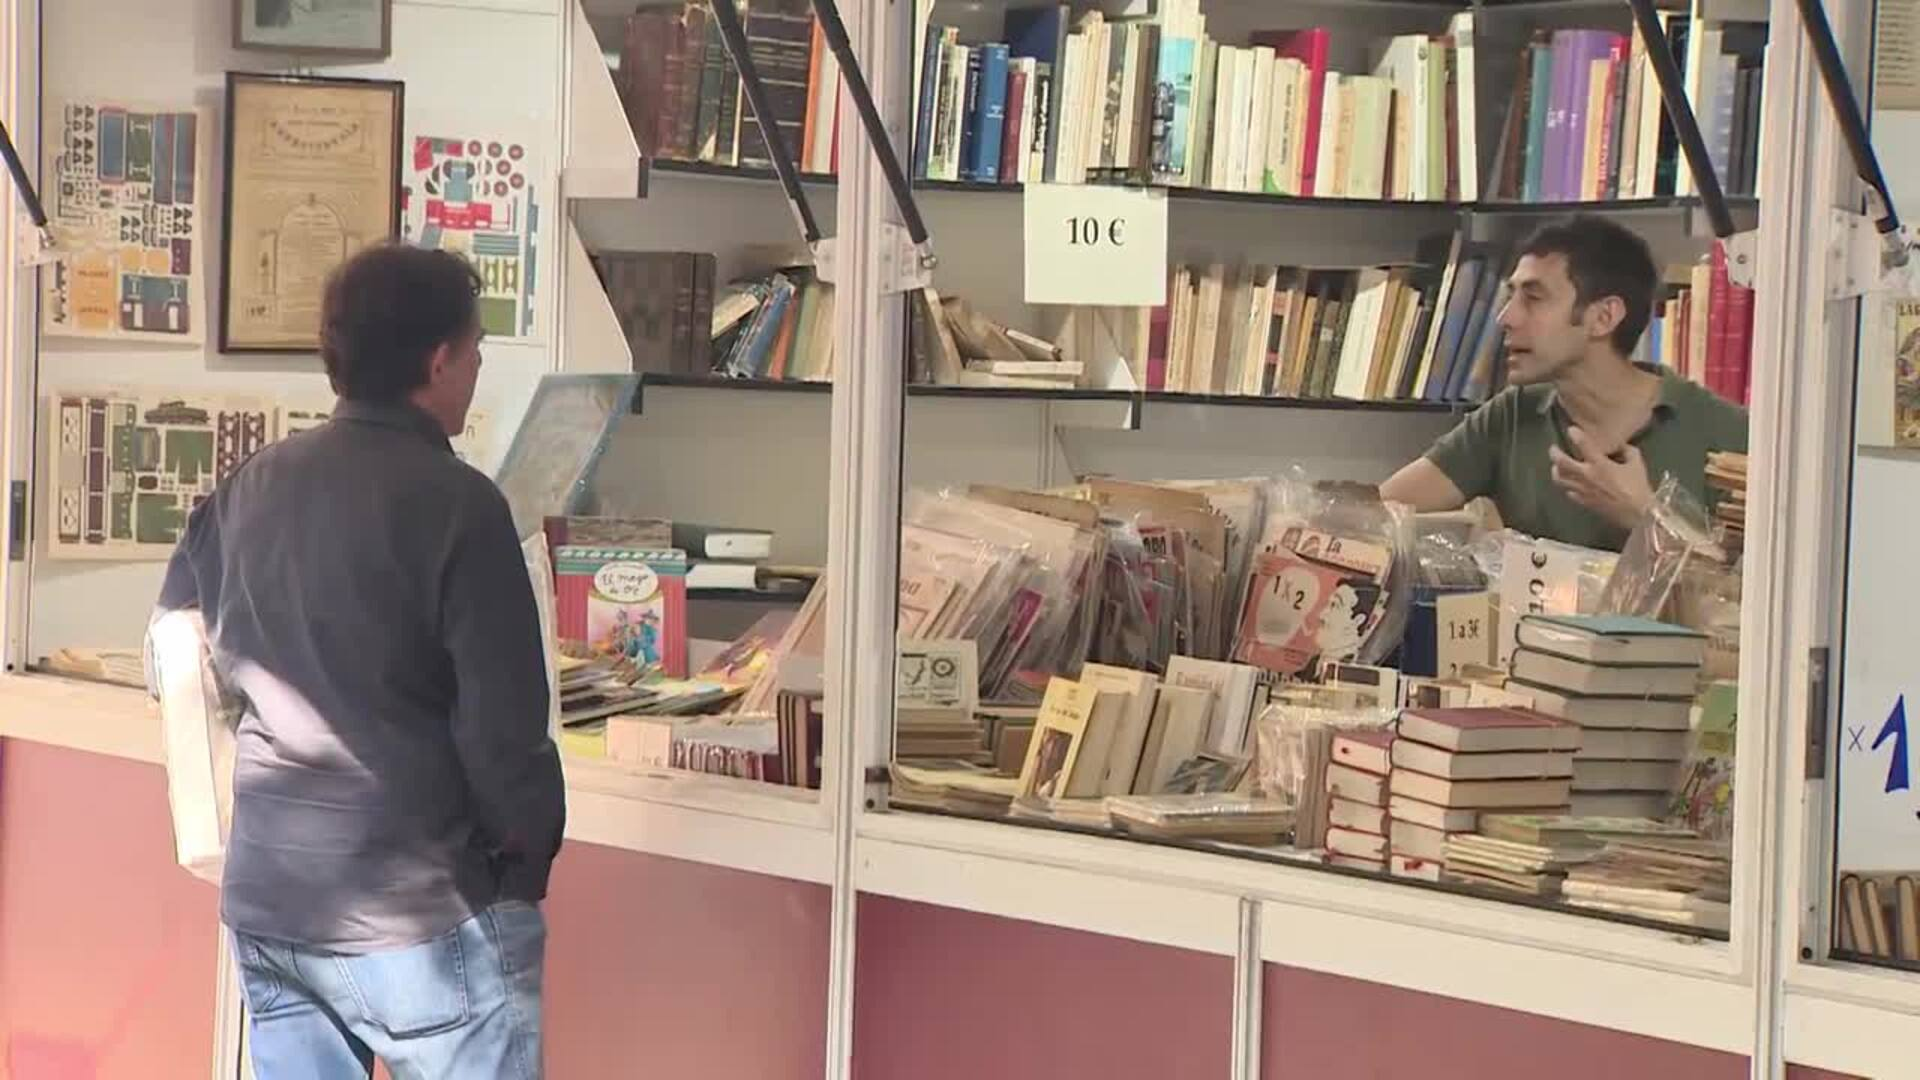 La Feria de Otoño del Libro Viejo y Antiguo homenajea a Antonio Mingote